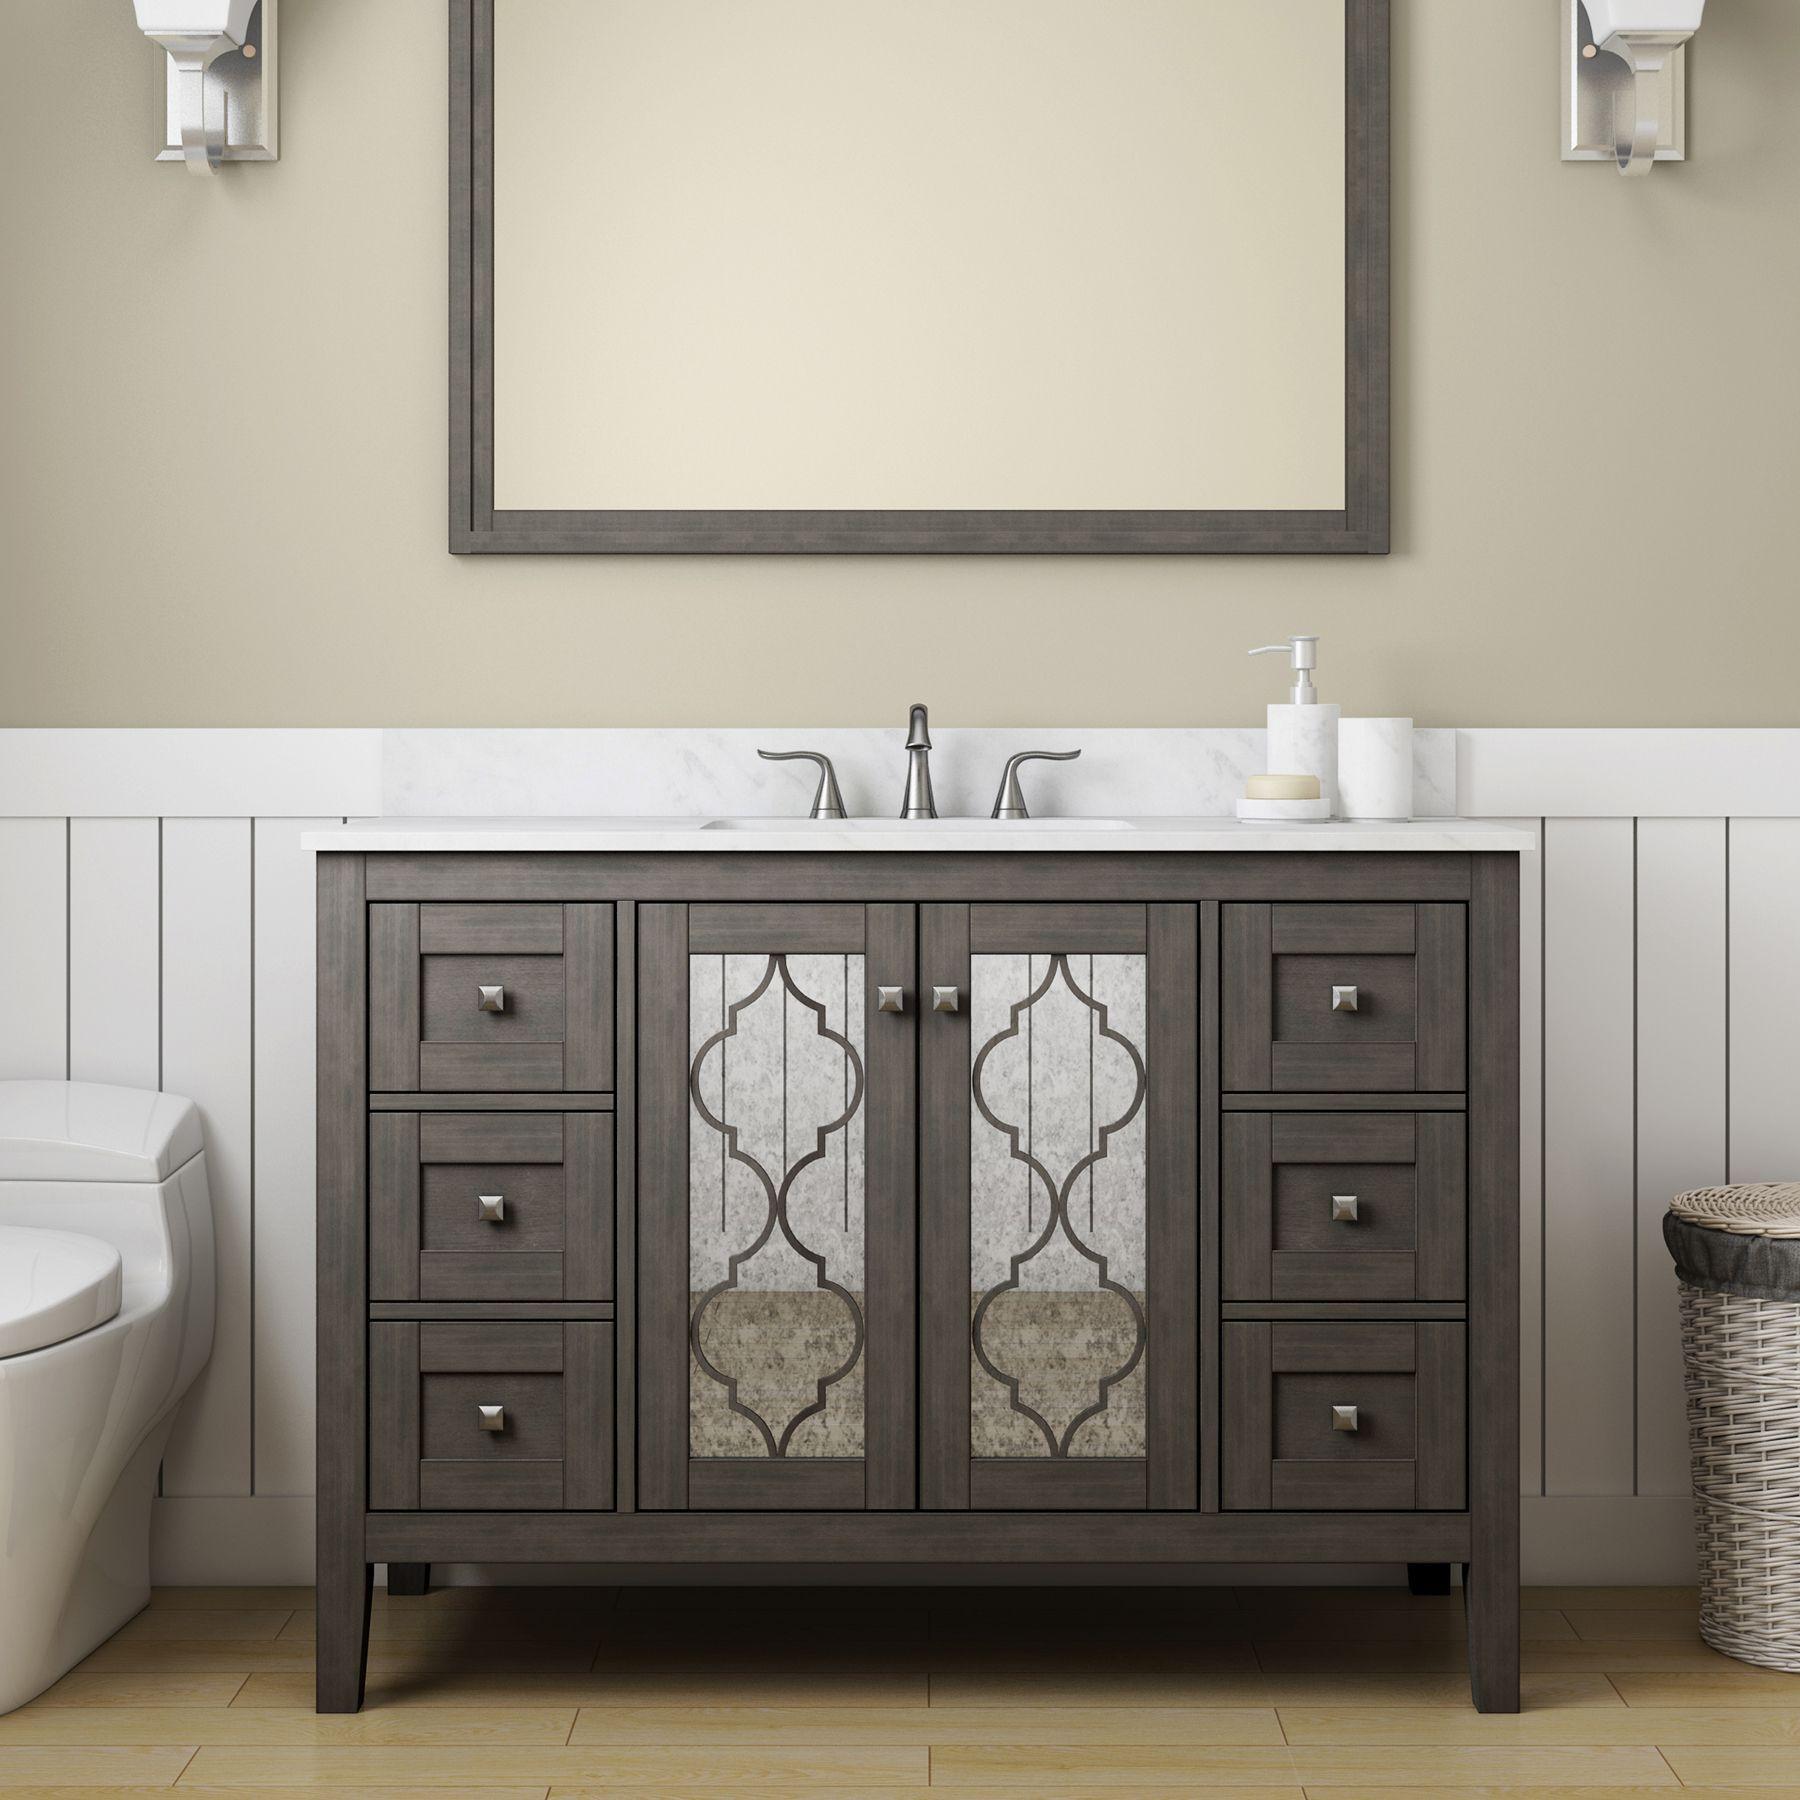 mDesign Towel Holder for Bath Vanity Countertops Stone Gray